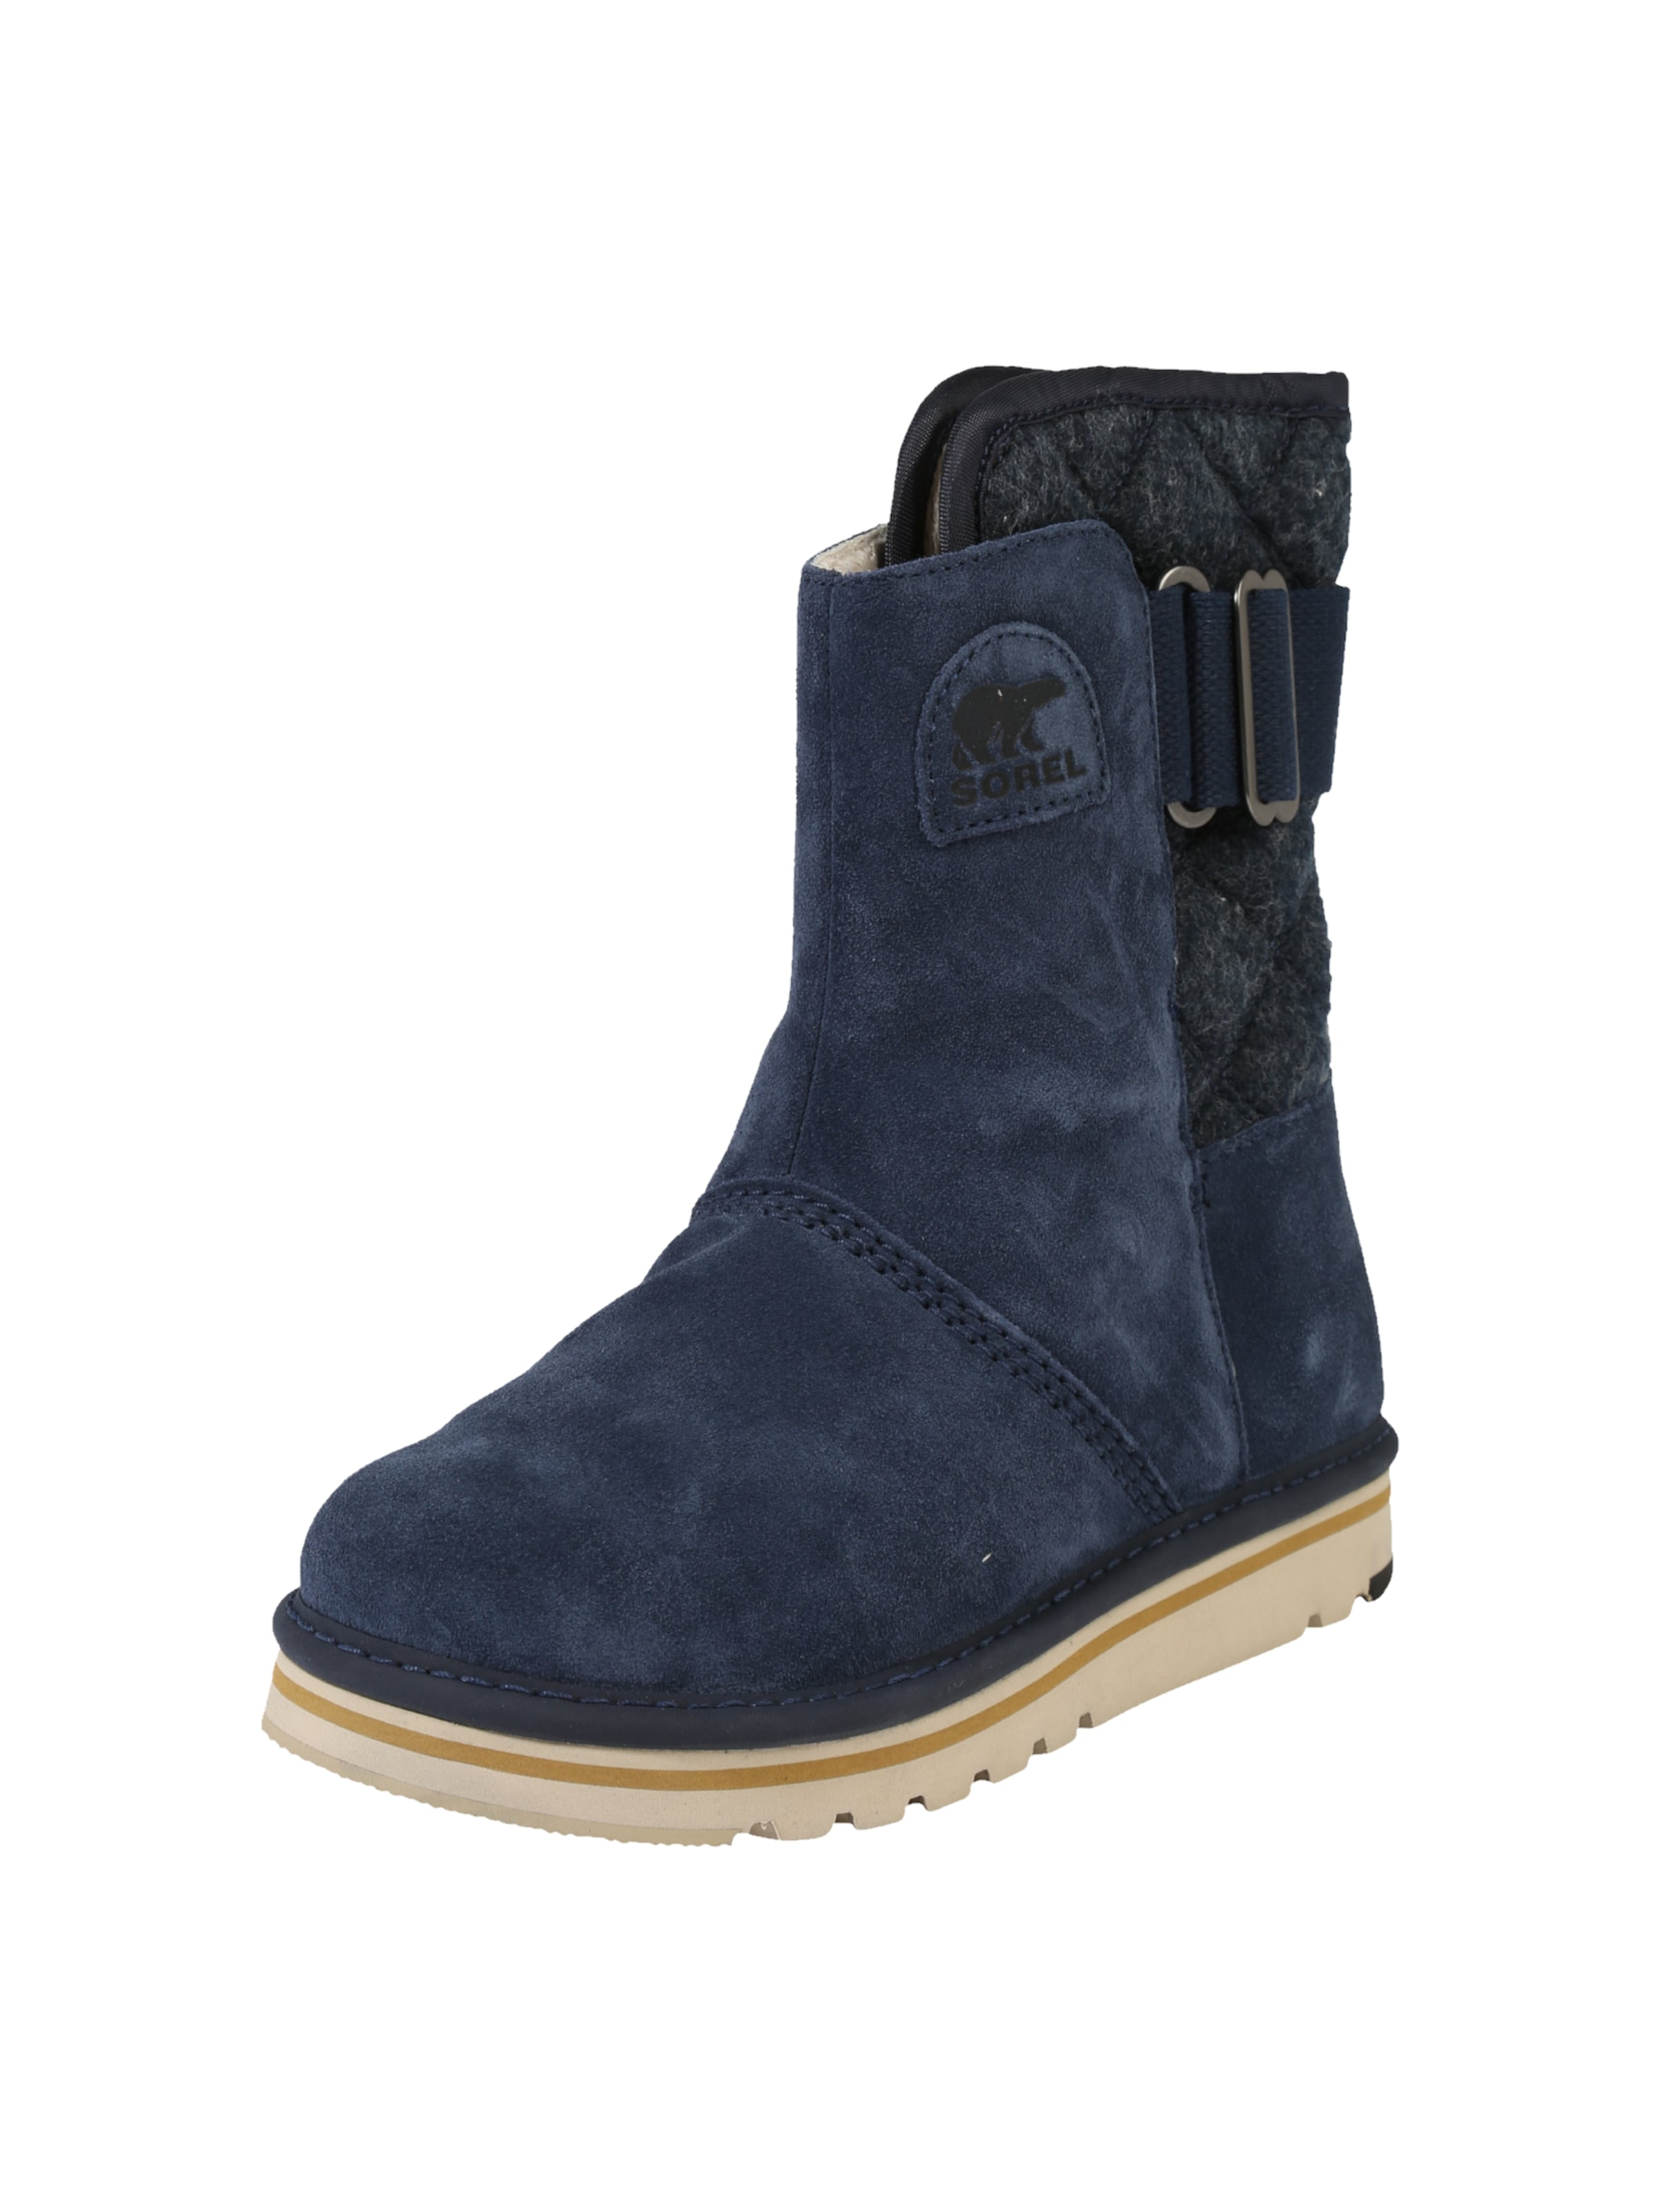 Haltbare Mode billige Schuhe SOREL | Snowboots 'Newbie' Schuhe Gut getragene Schuhe